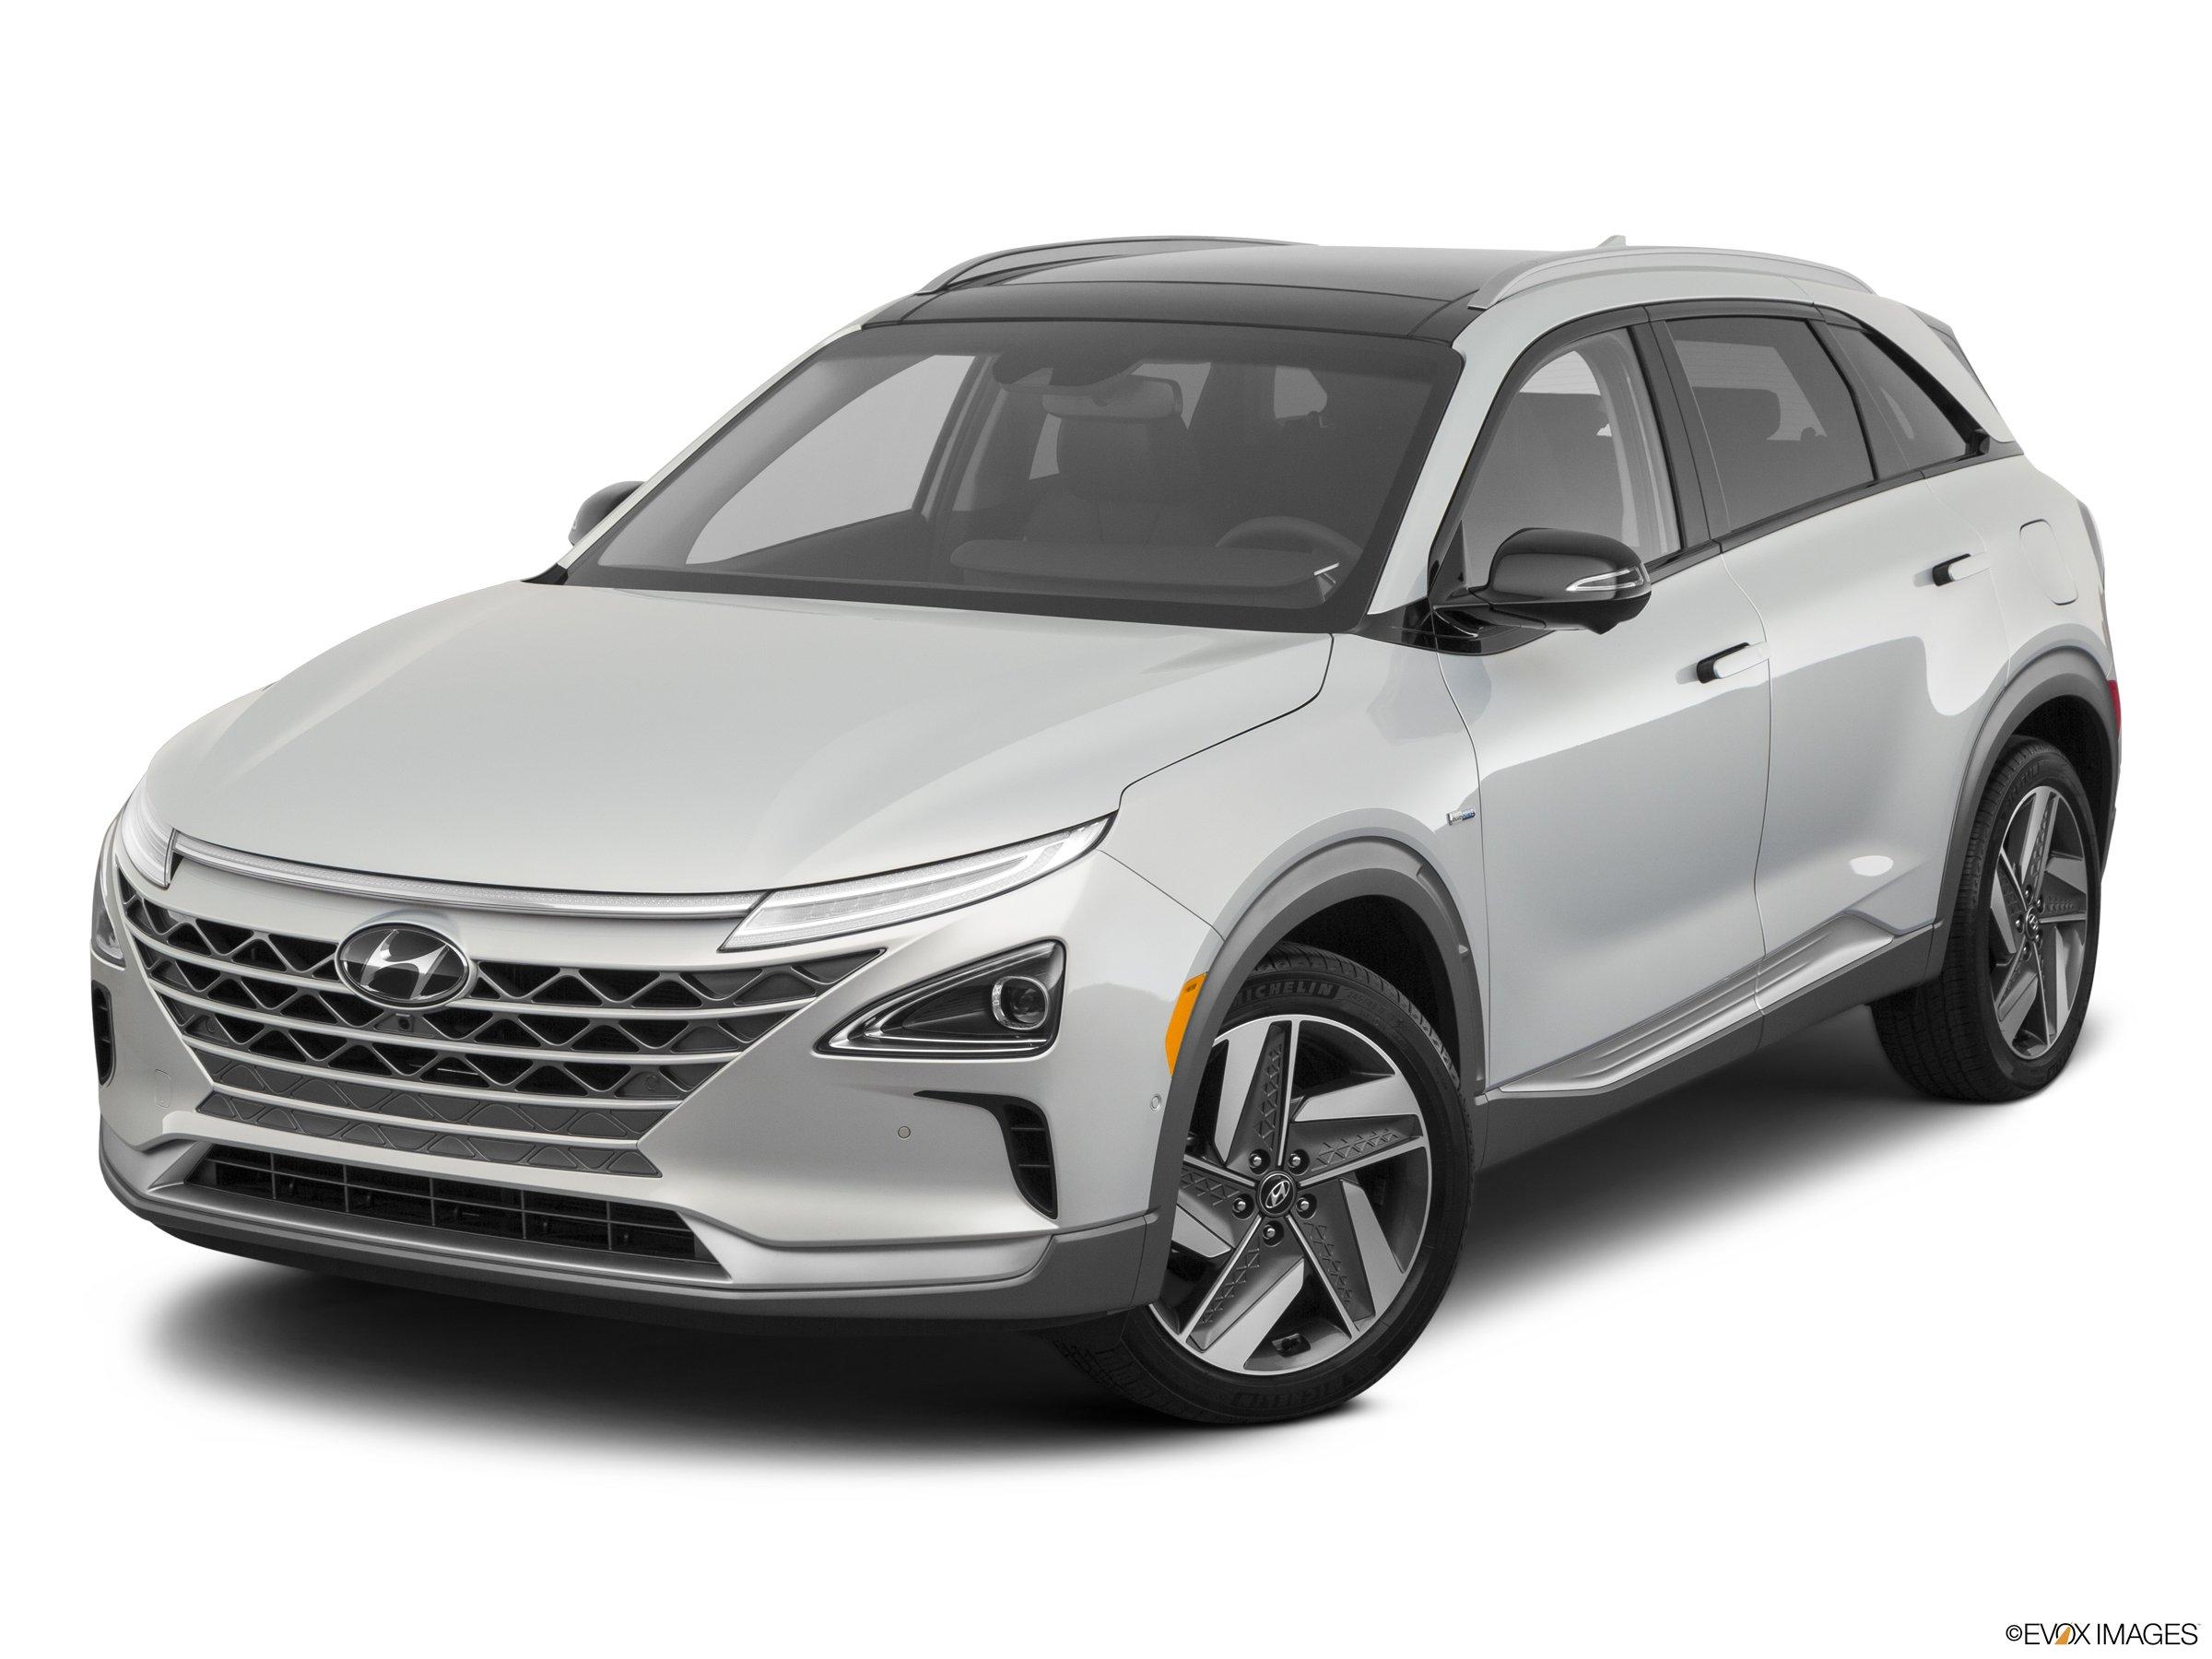 2020 Hyundai NEXO Limited FWD CUV